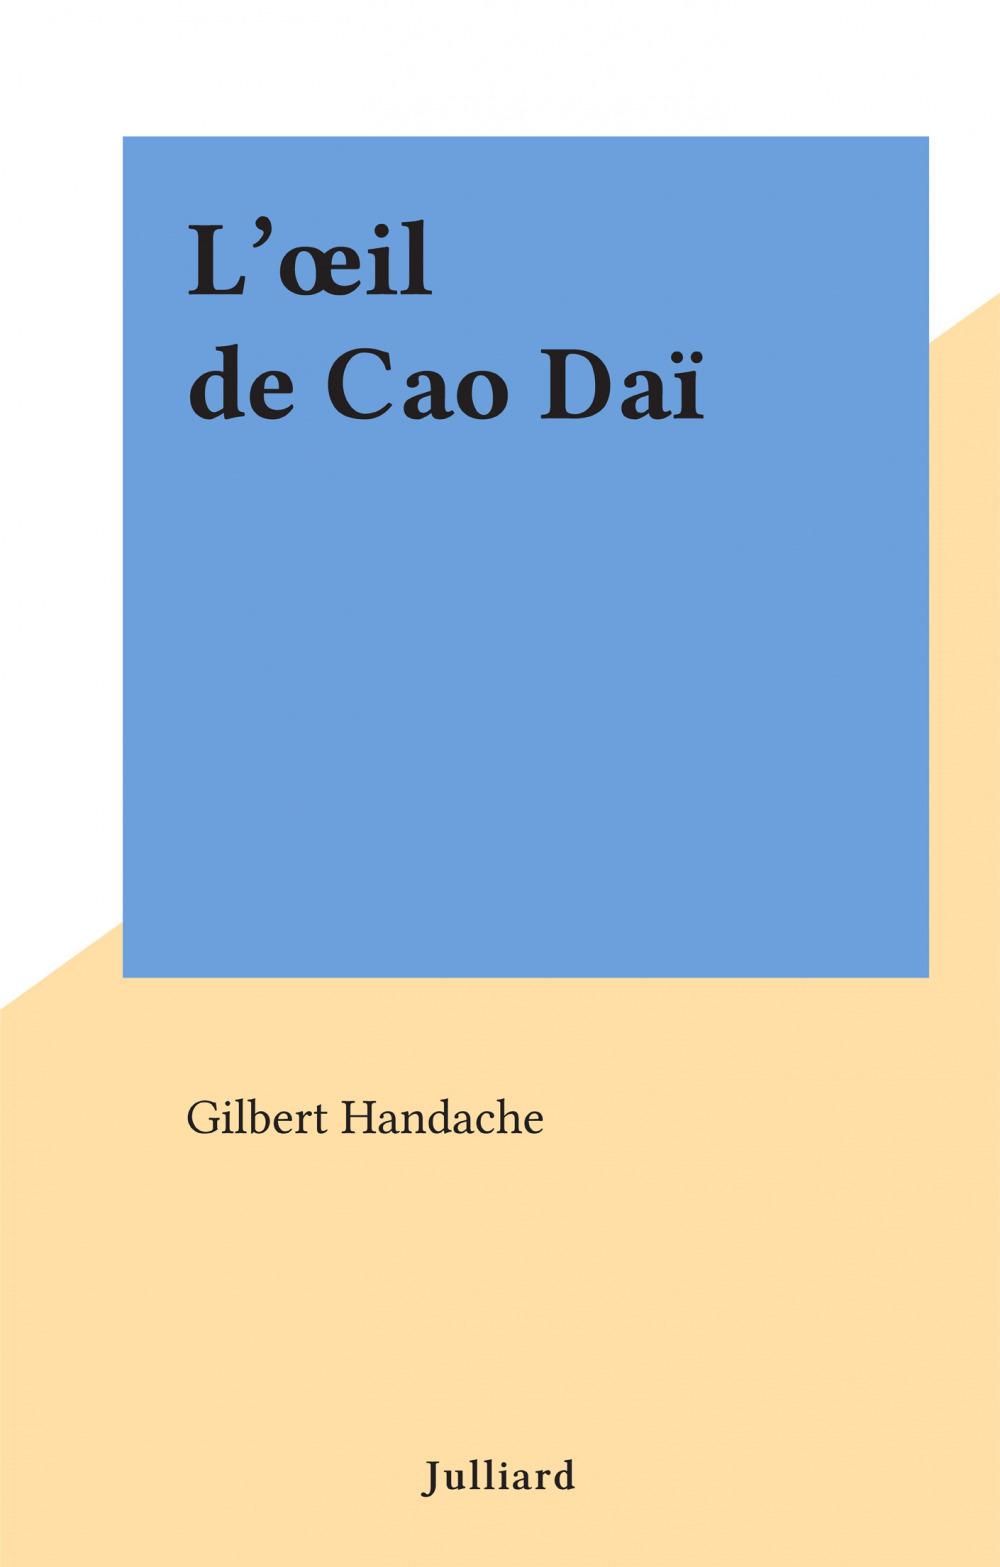 L'oeil de Cao Daï  - Gilbert Handache